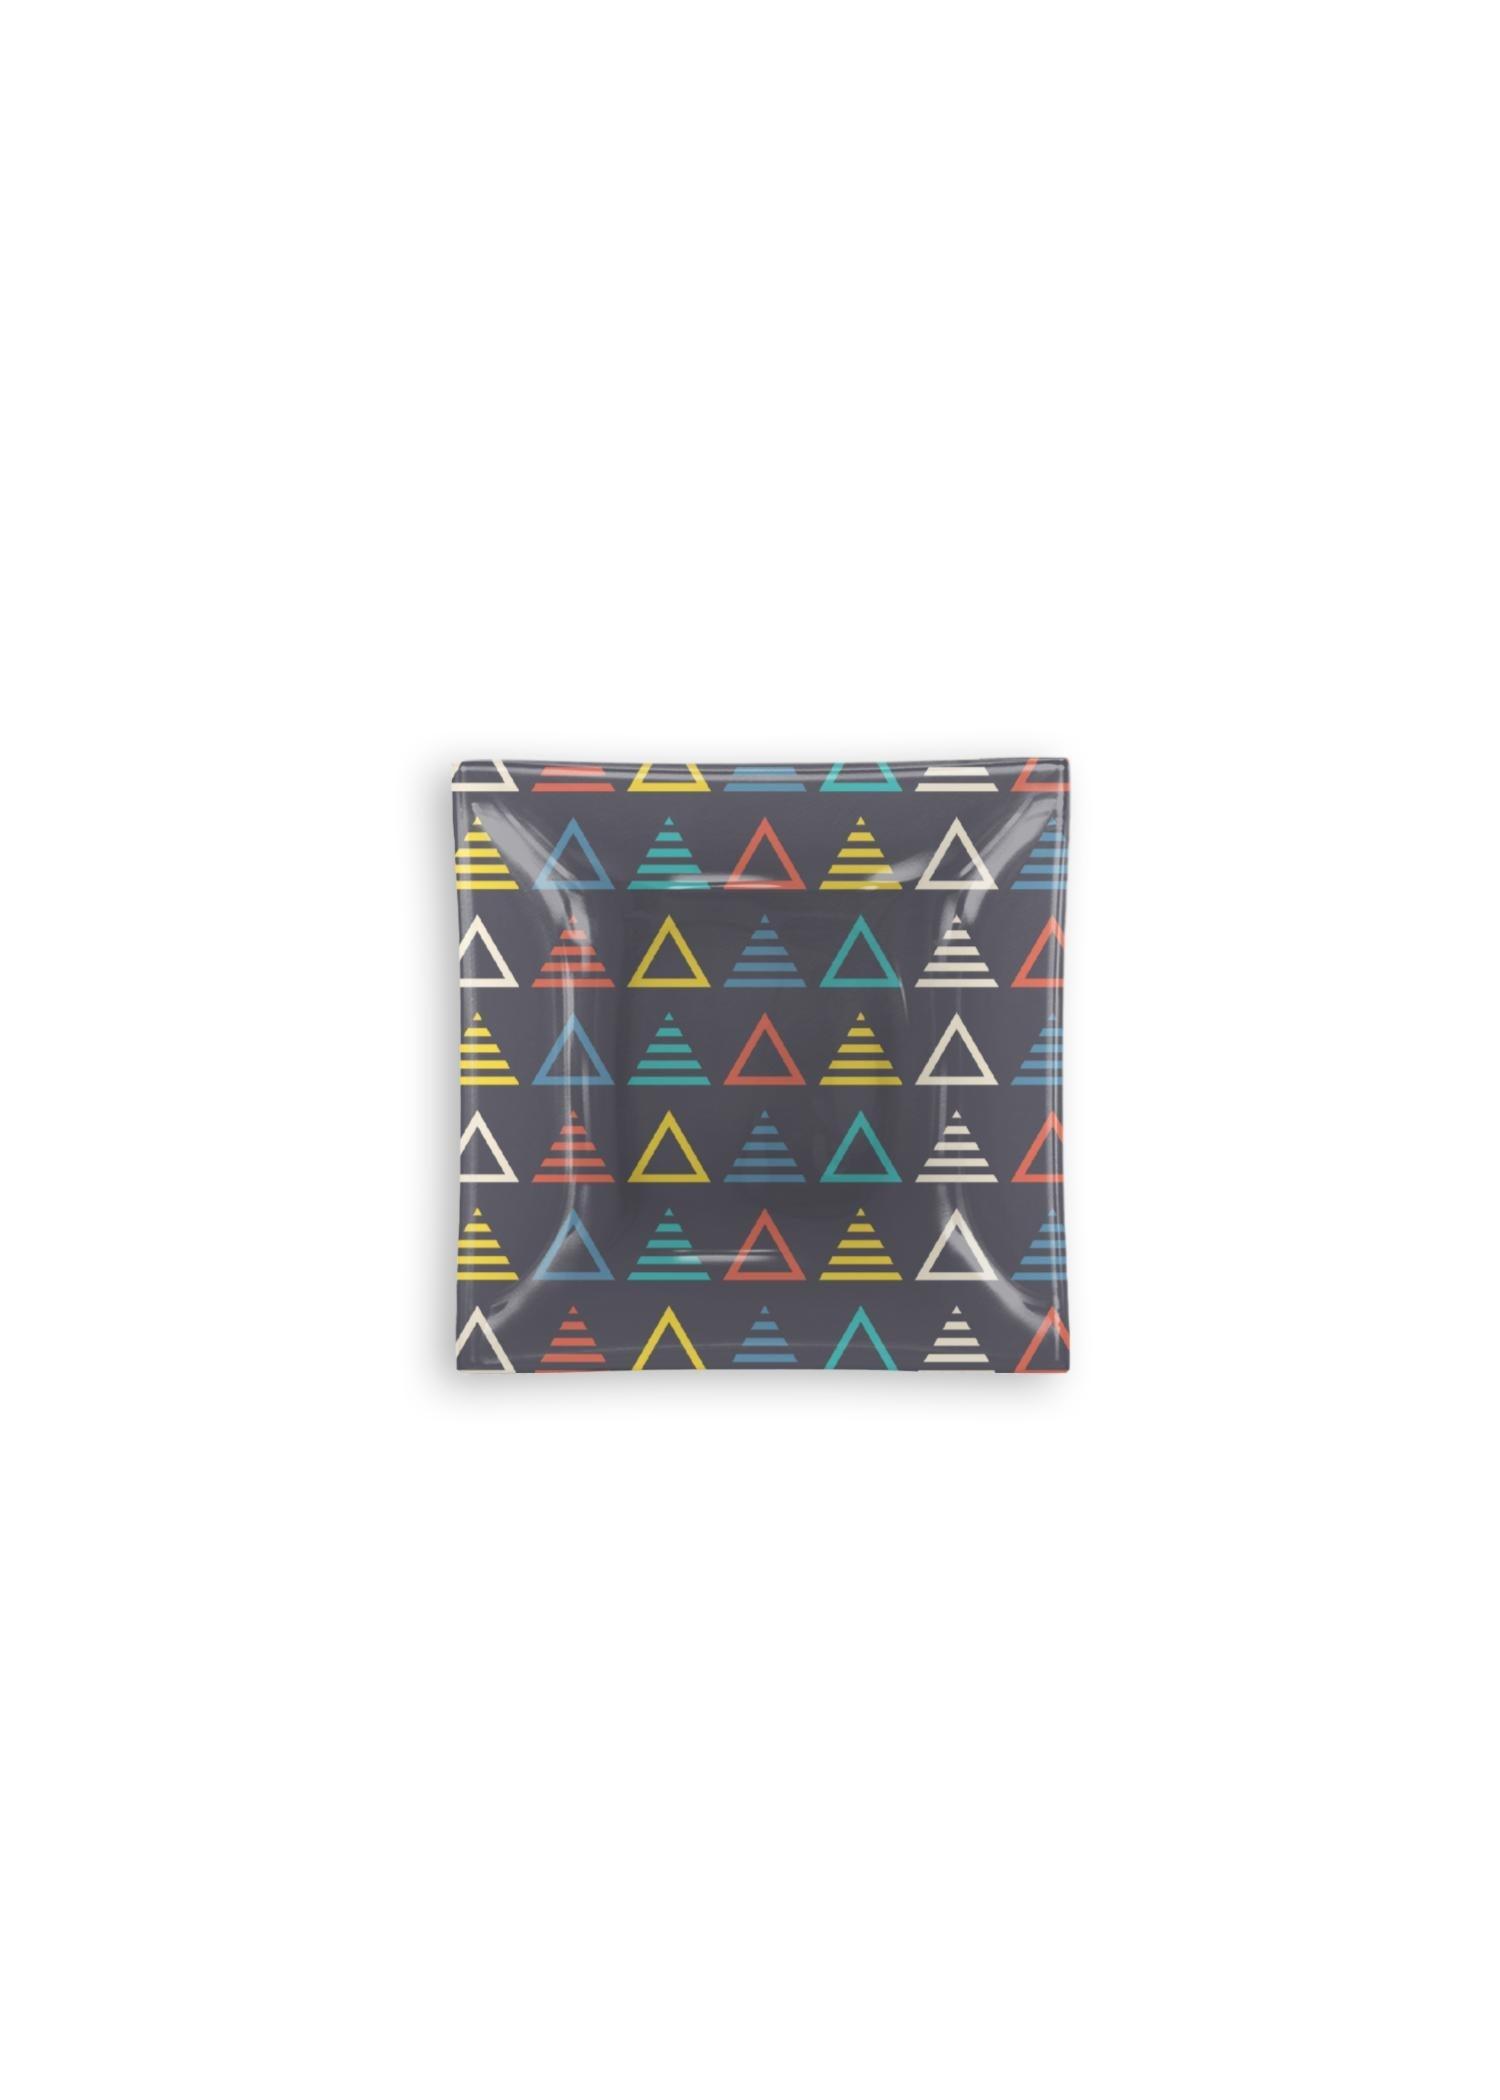 VIDA Square Glass Tray - Music Symmetric Triangle by VIDA Original Artist  - Size: Small